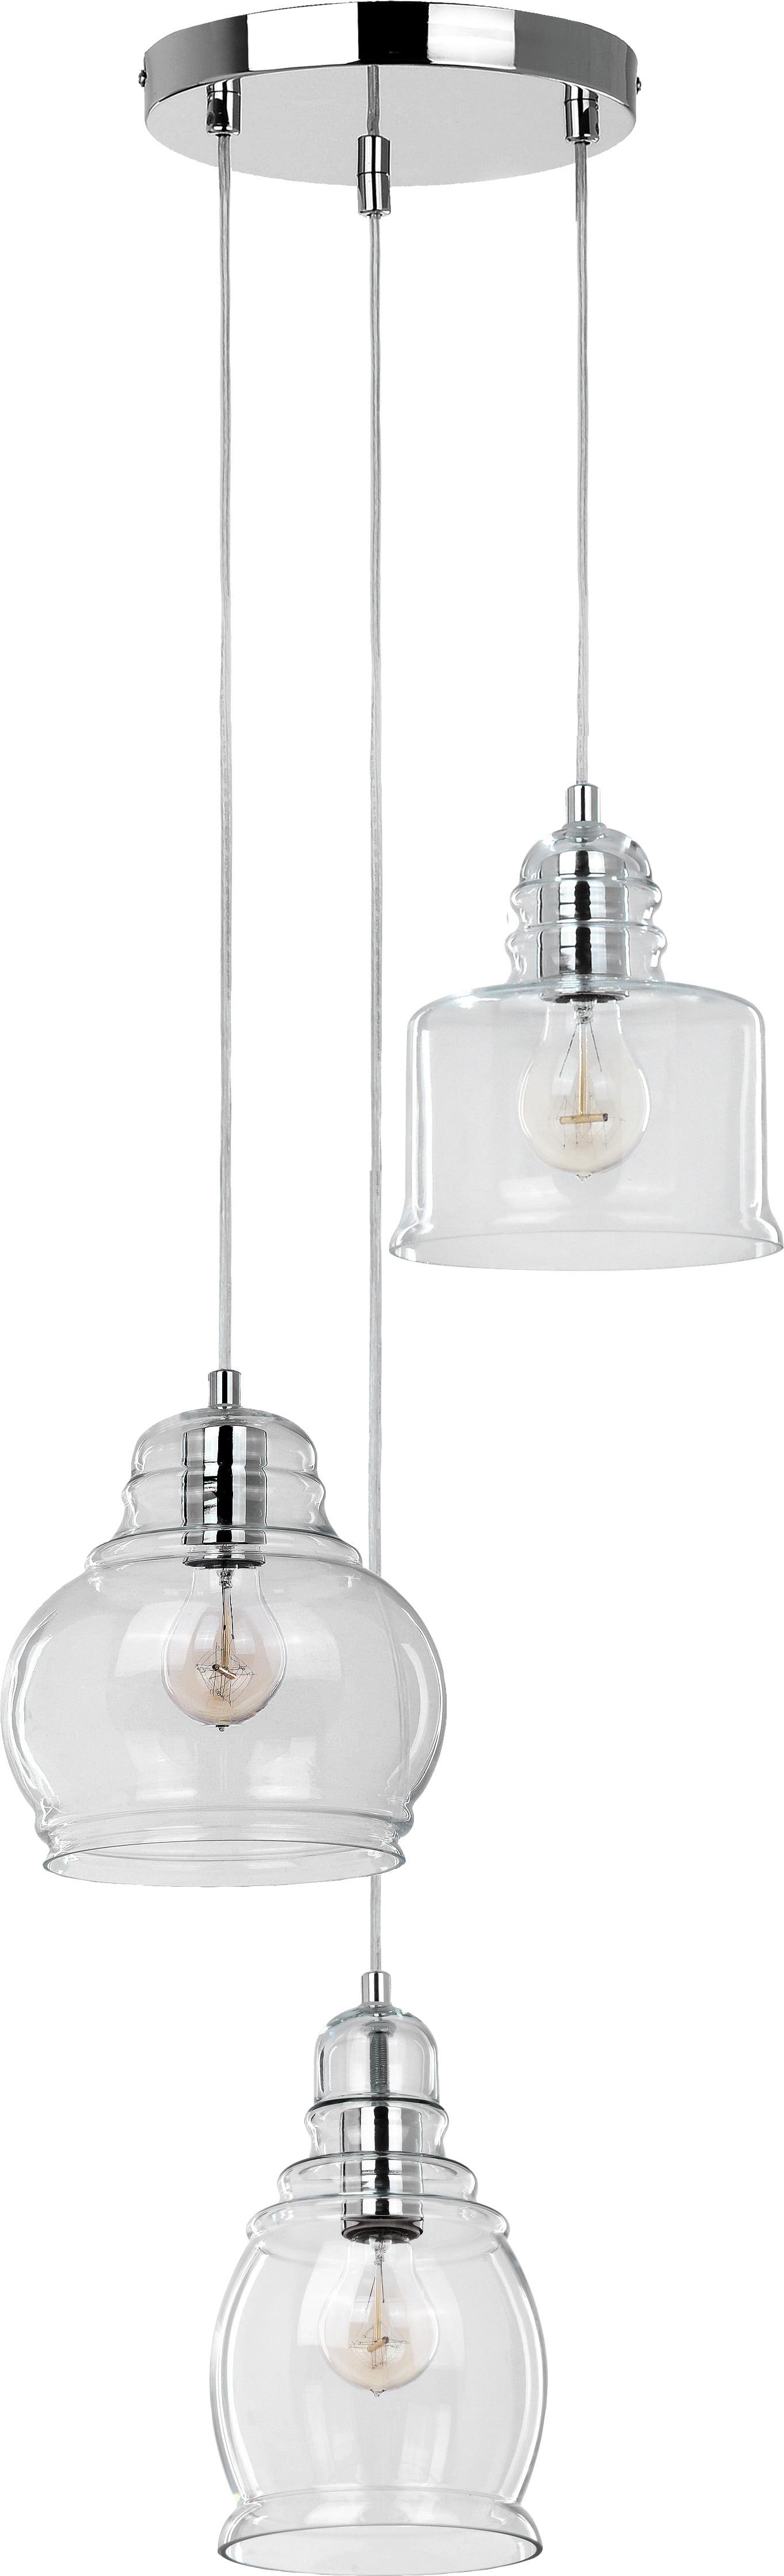 Nova three-point pendant lamp with glass lenses